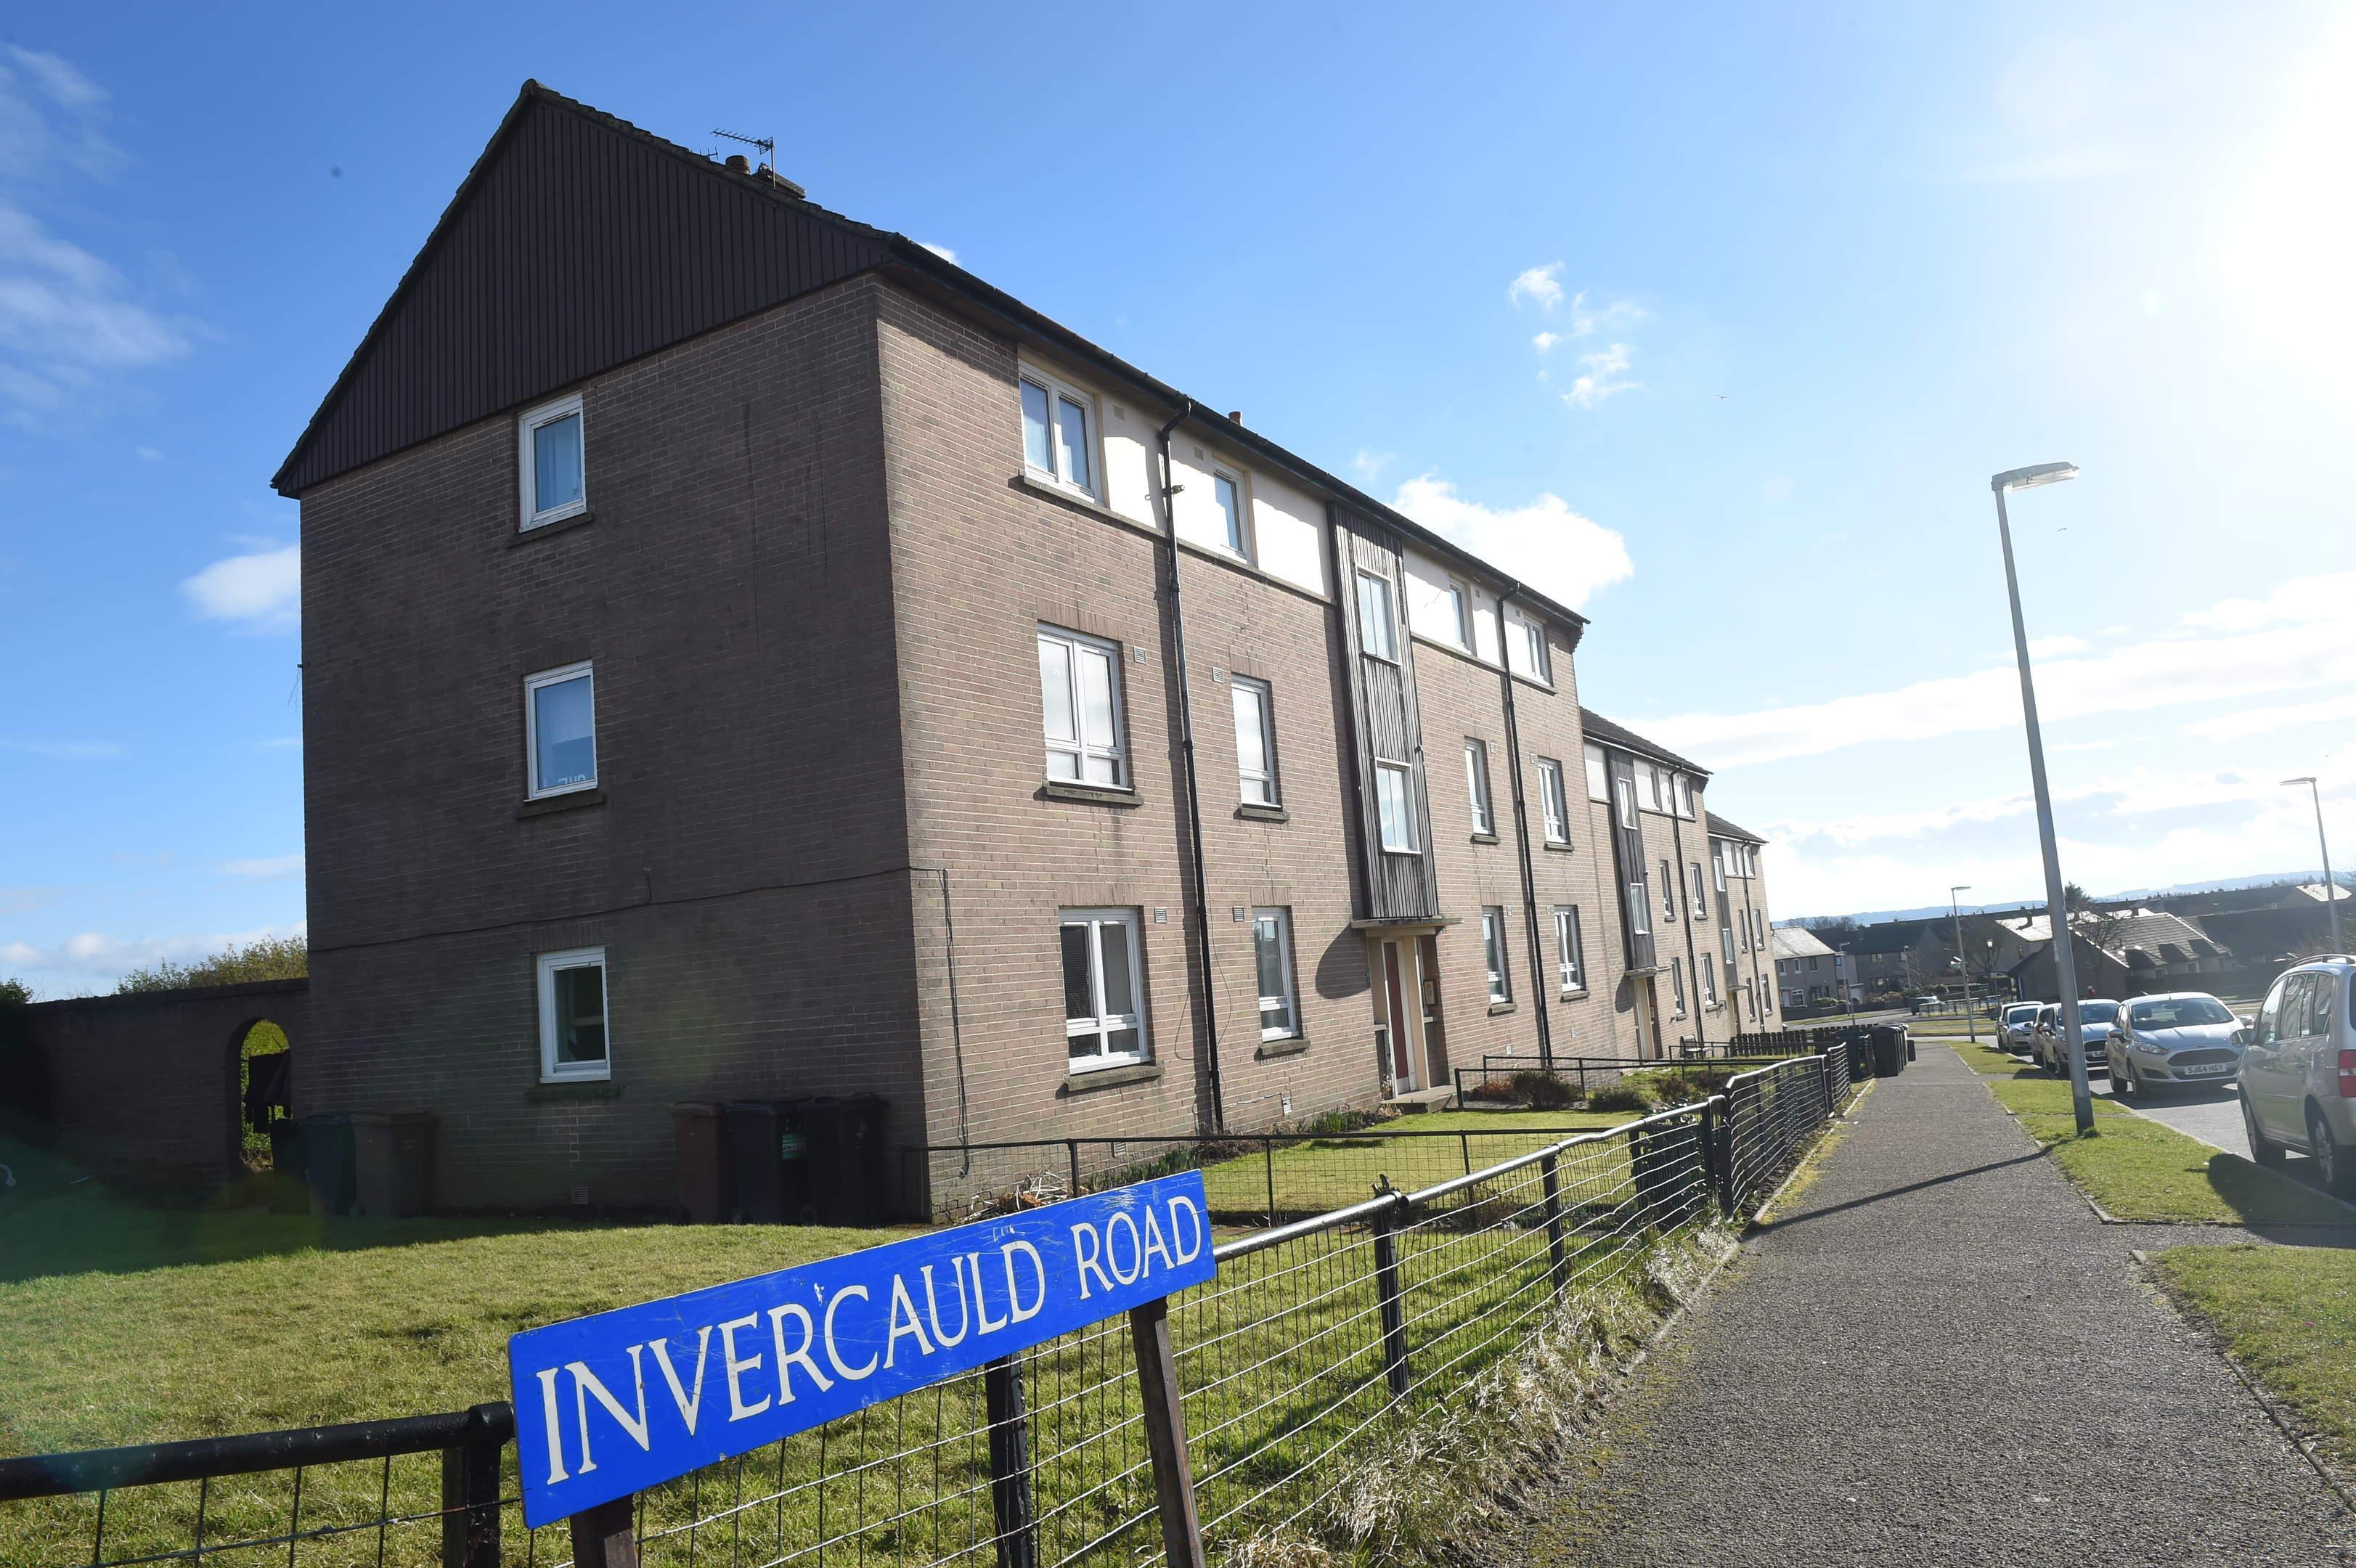 The incident happened on Invercauld Road.